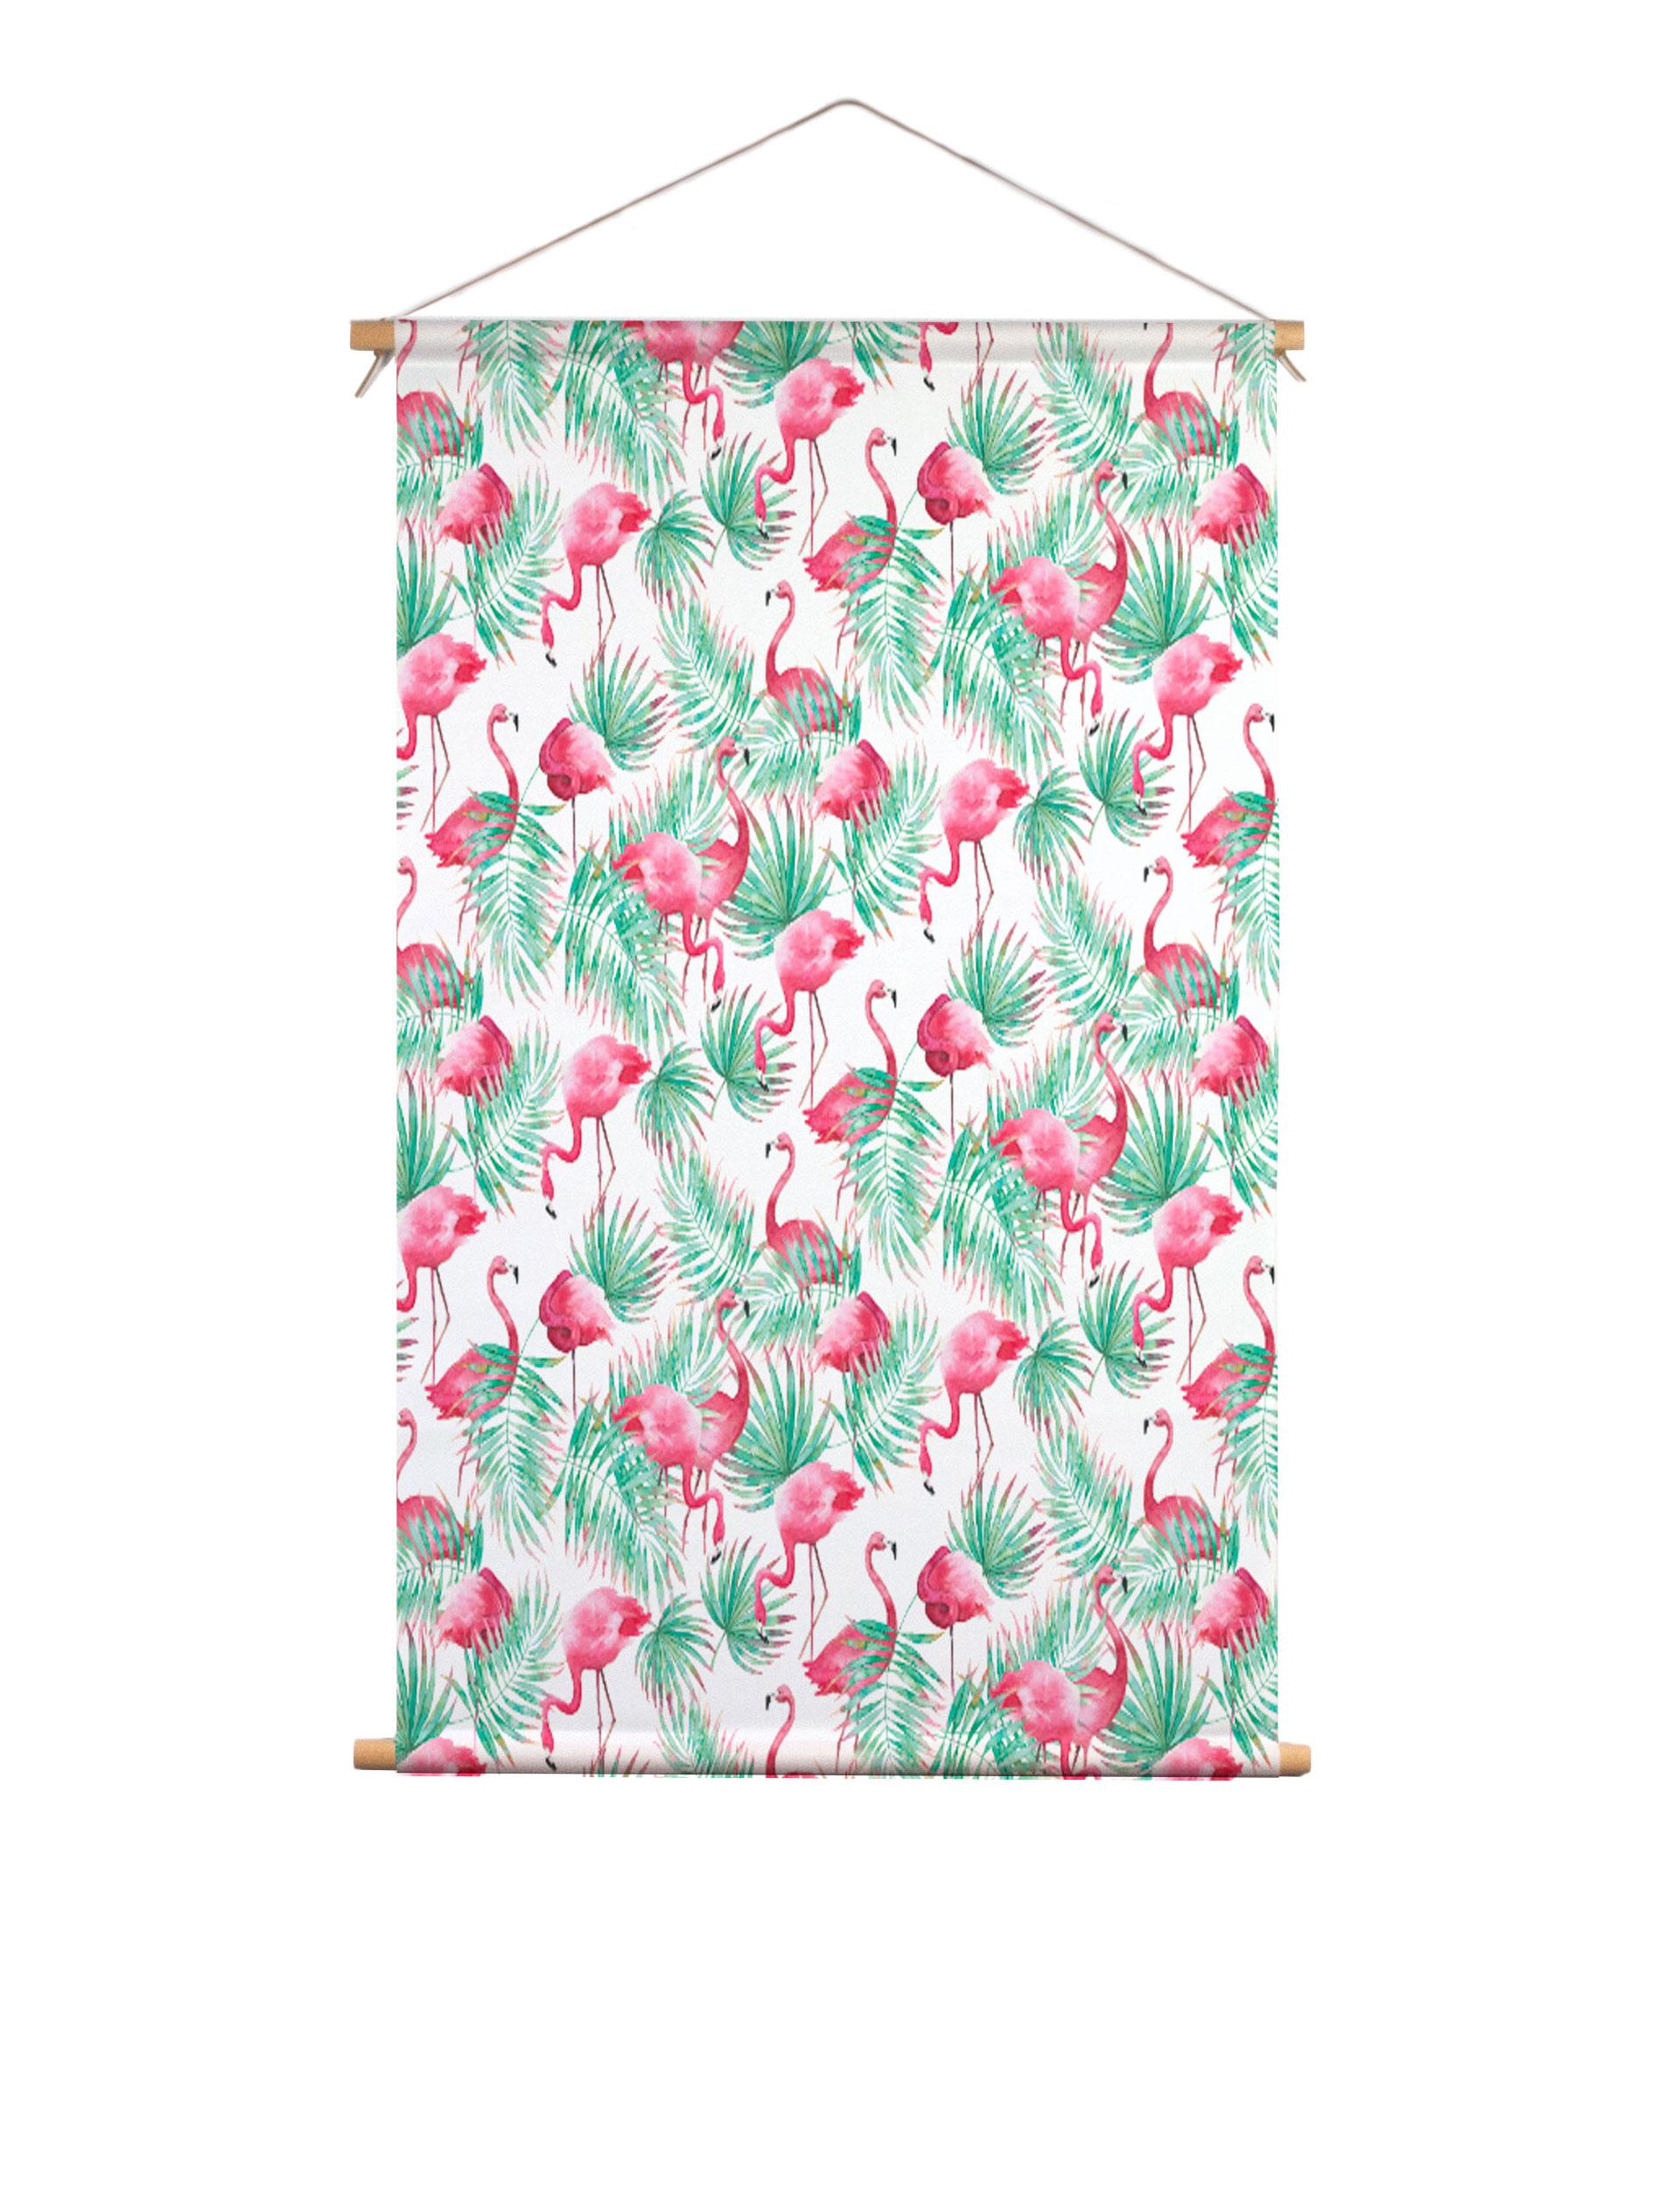 Isabella_FlamingoParadiseSmall_textielposter